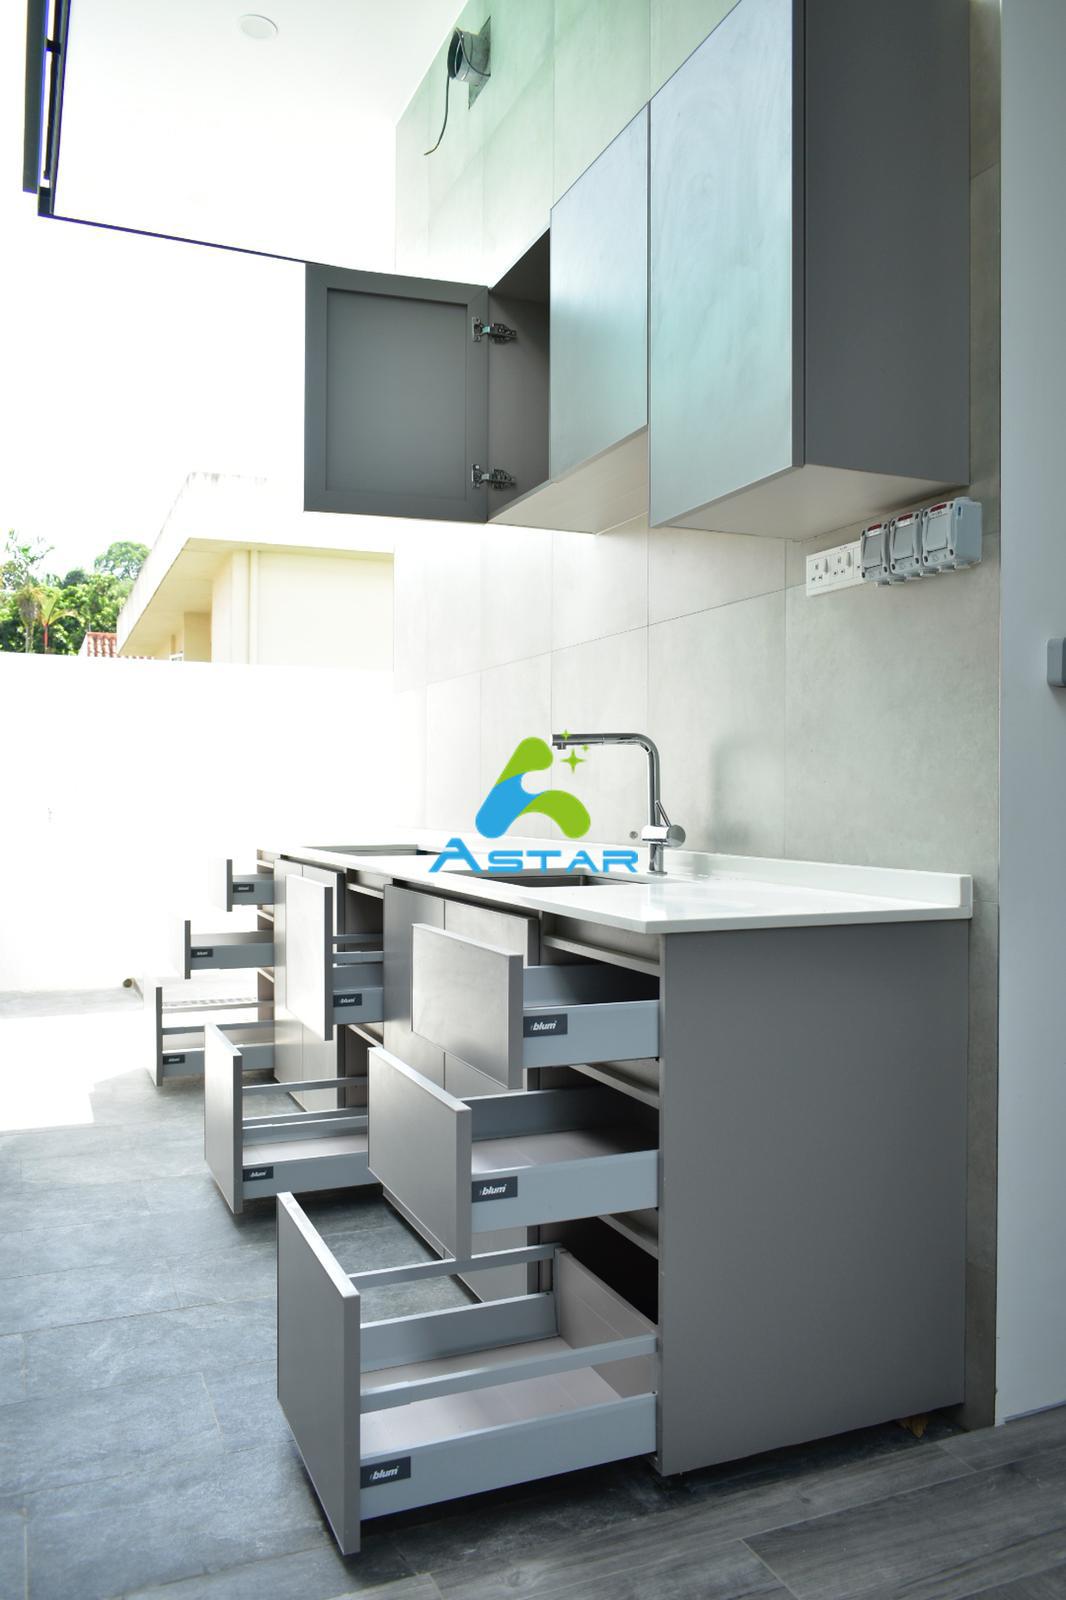 astar furnishing complete projects aluminium kitchen cabinet vanity cabinet wardrobe gardenia road 04